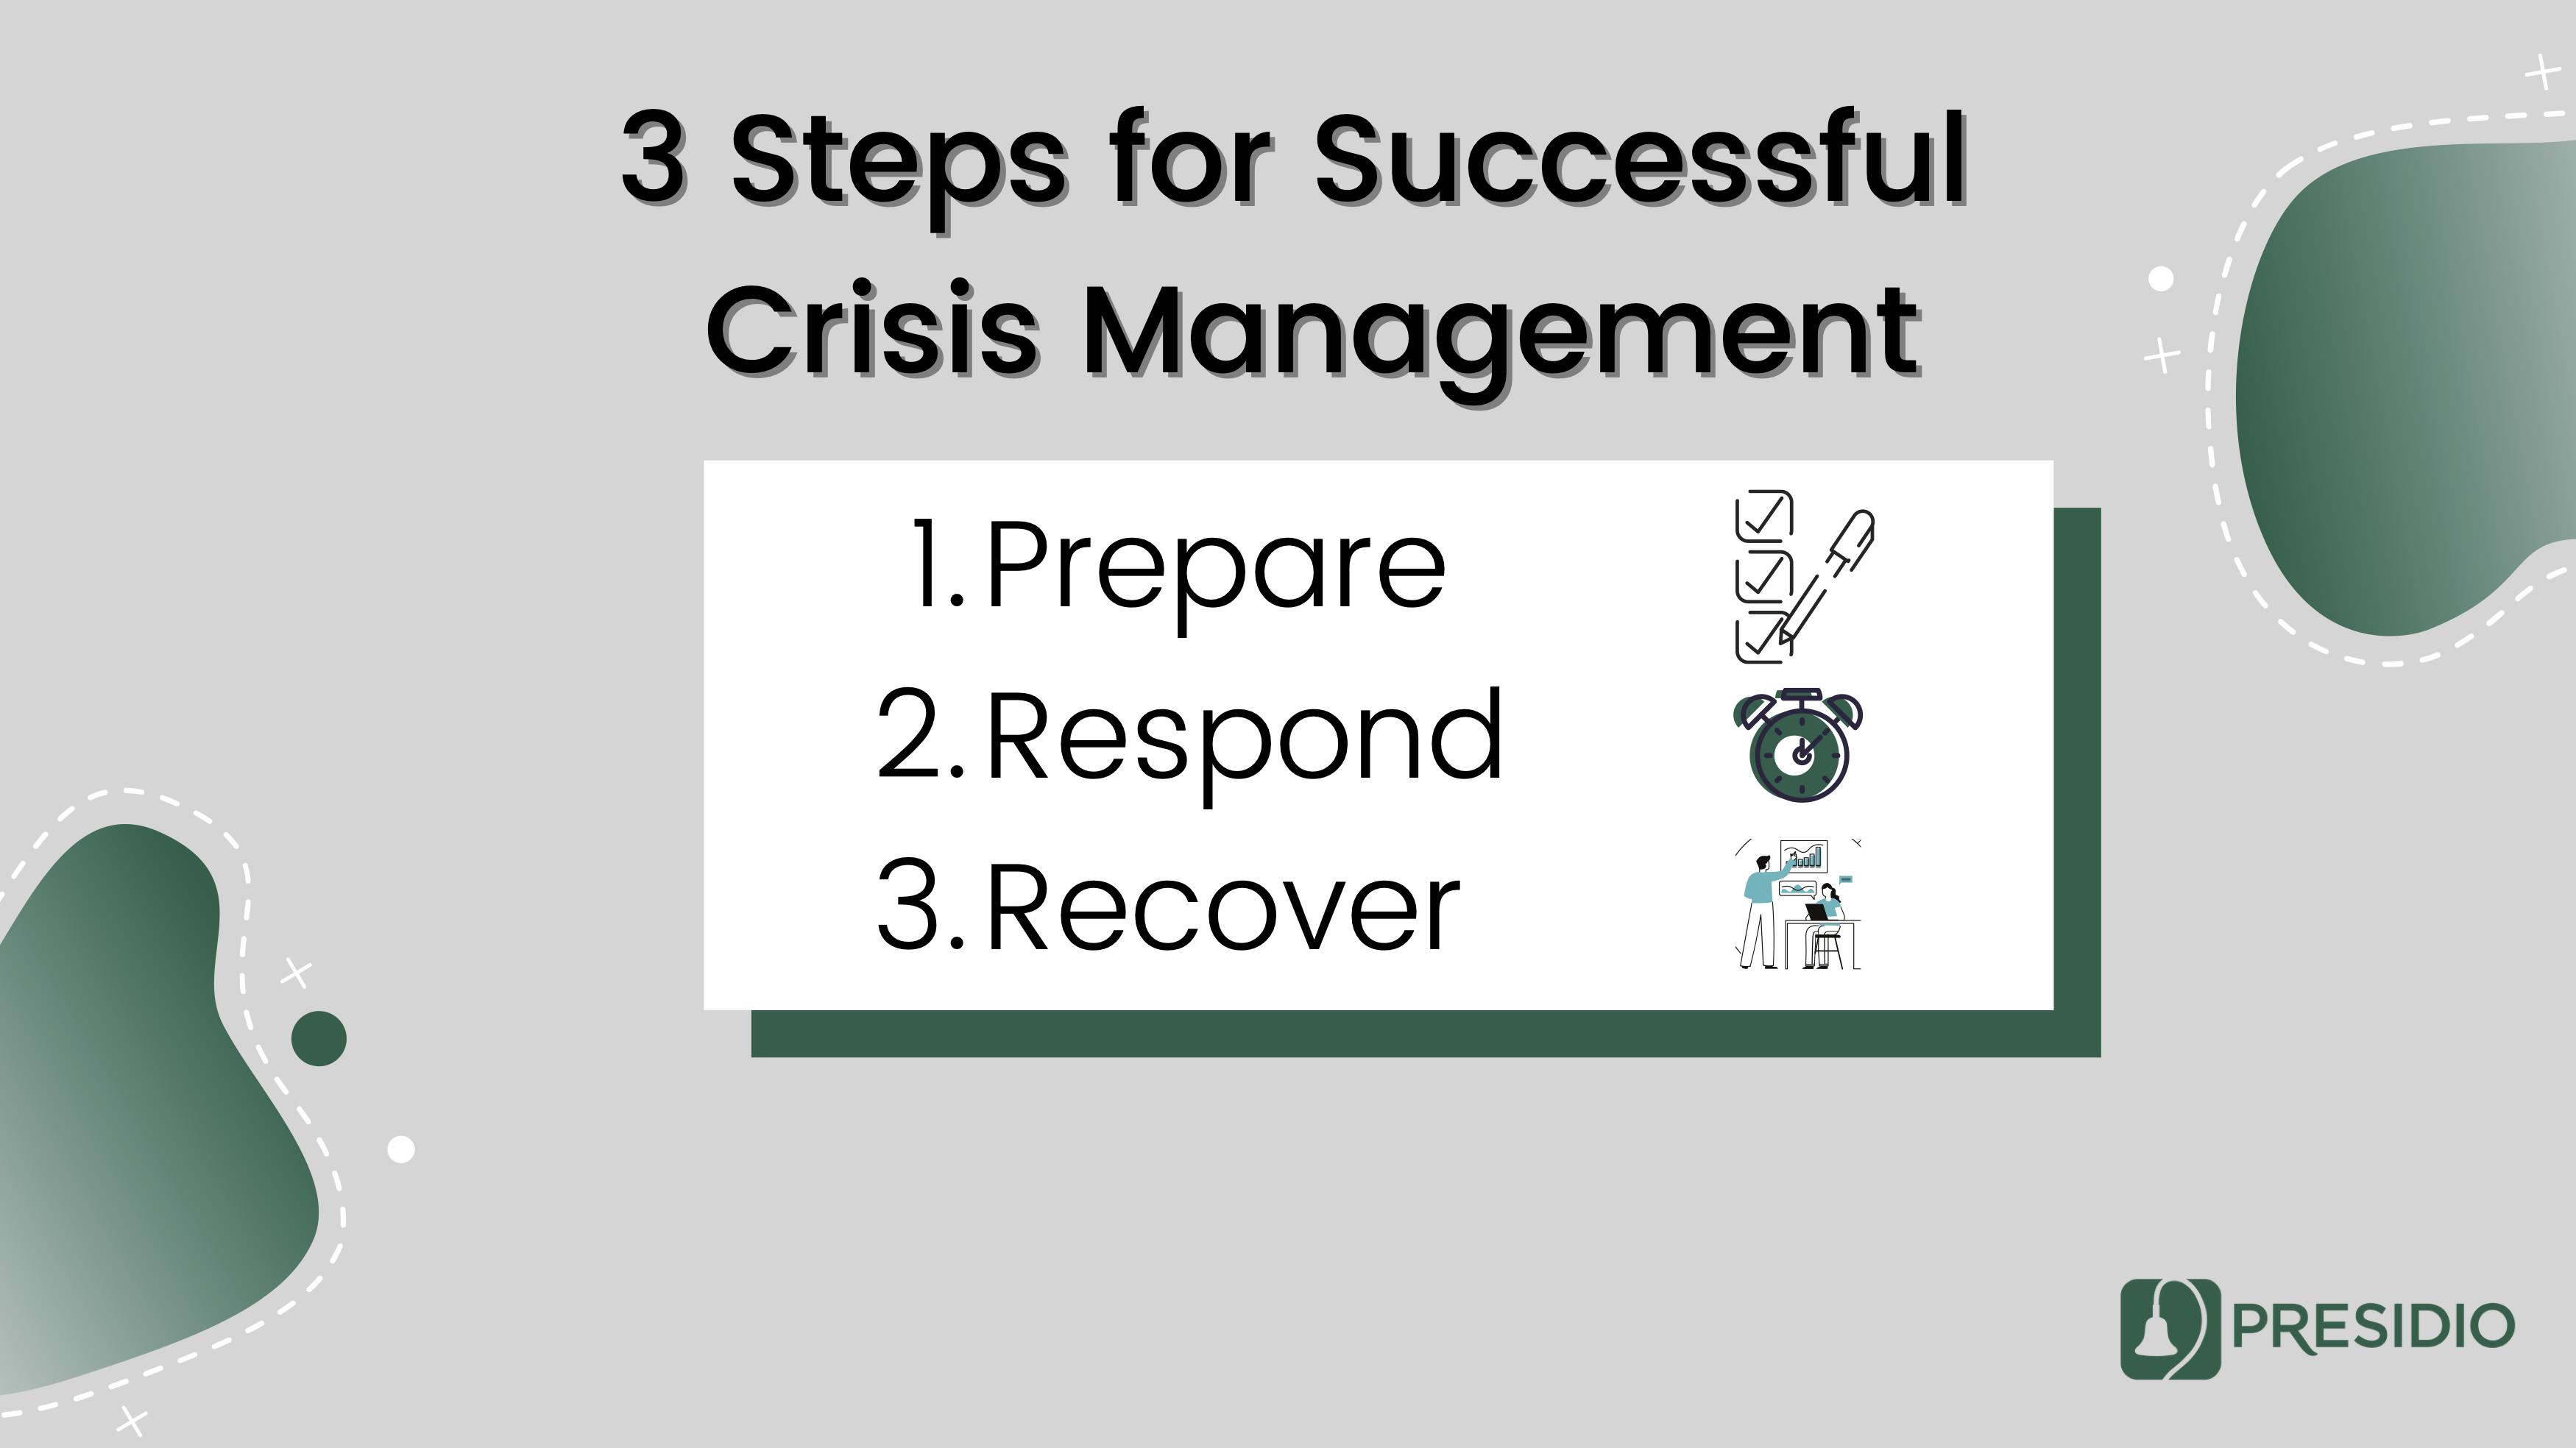 3 Steps for Successful Crisis Management